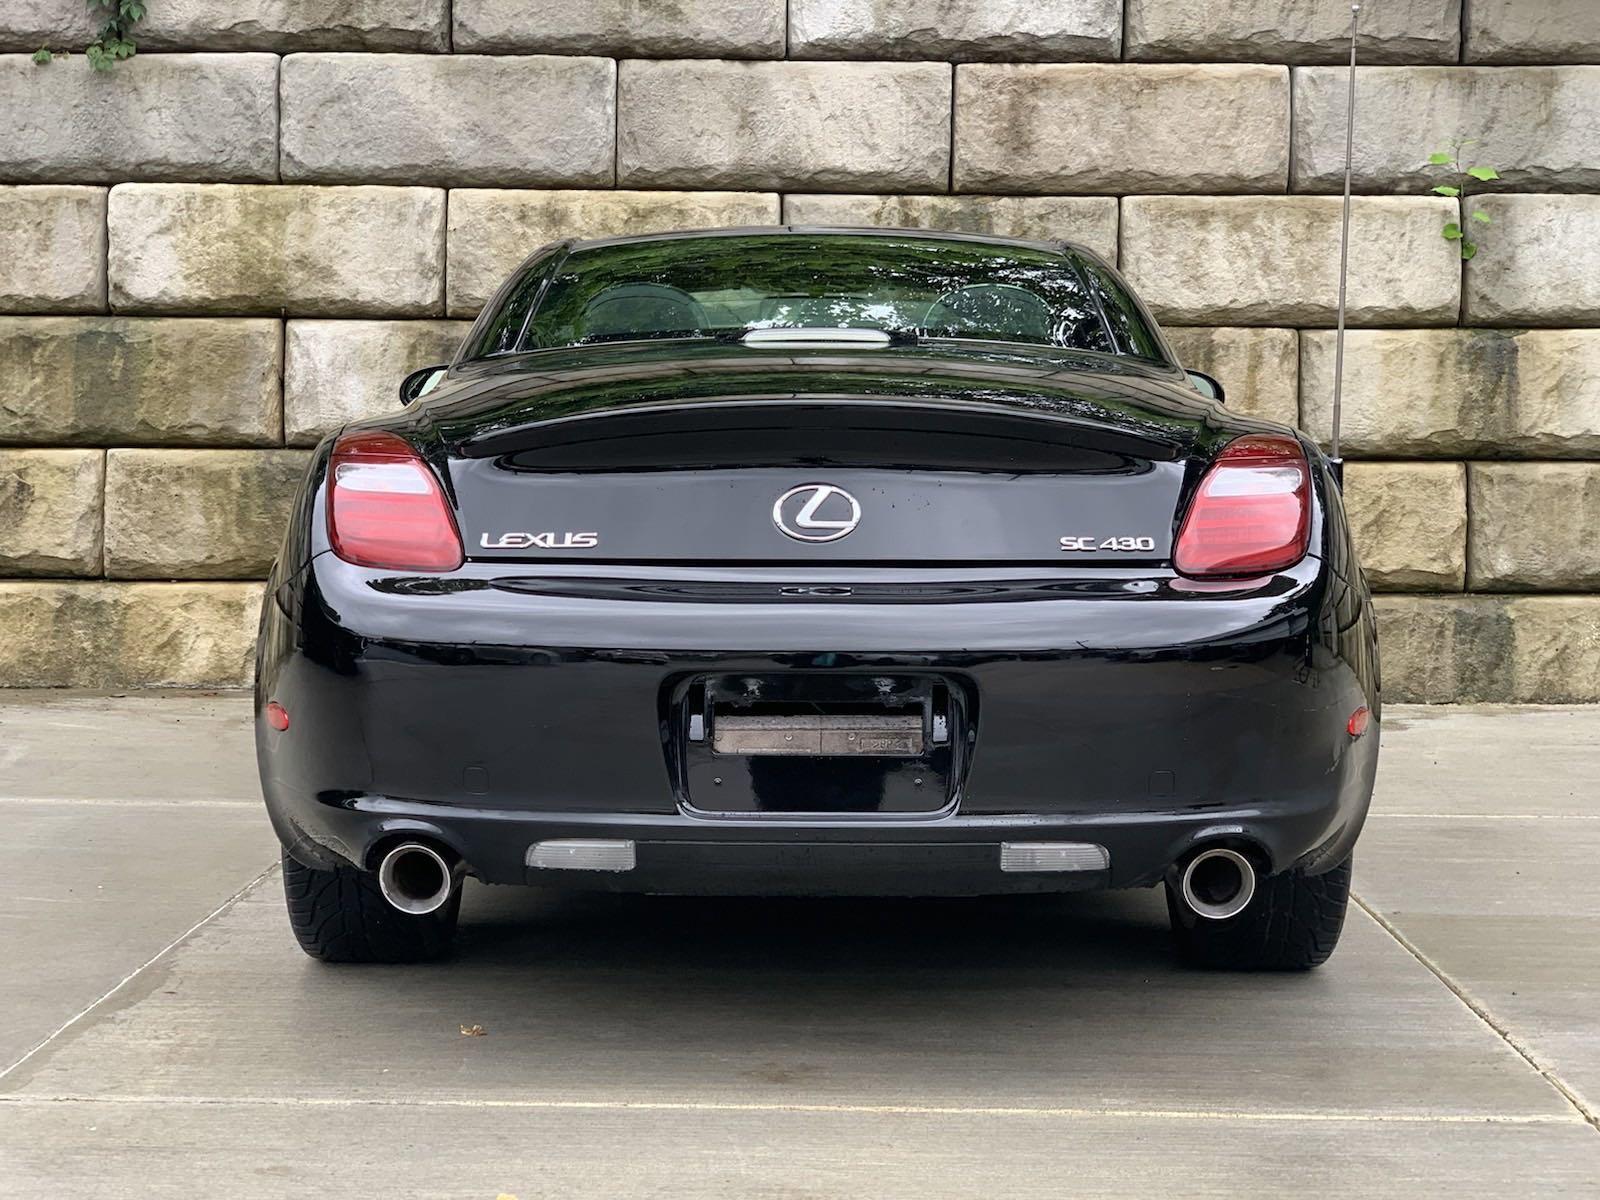 2007 Lexus SC 430 Convertible